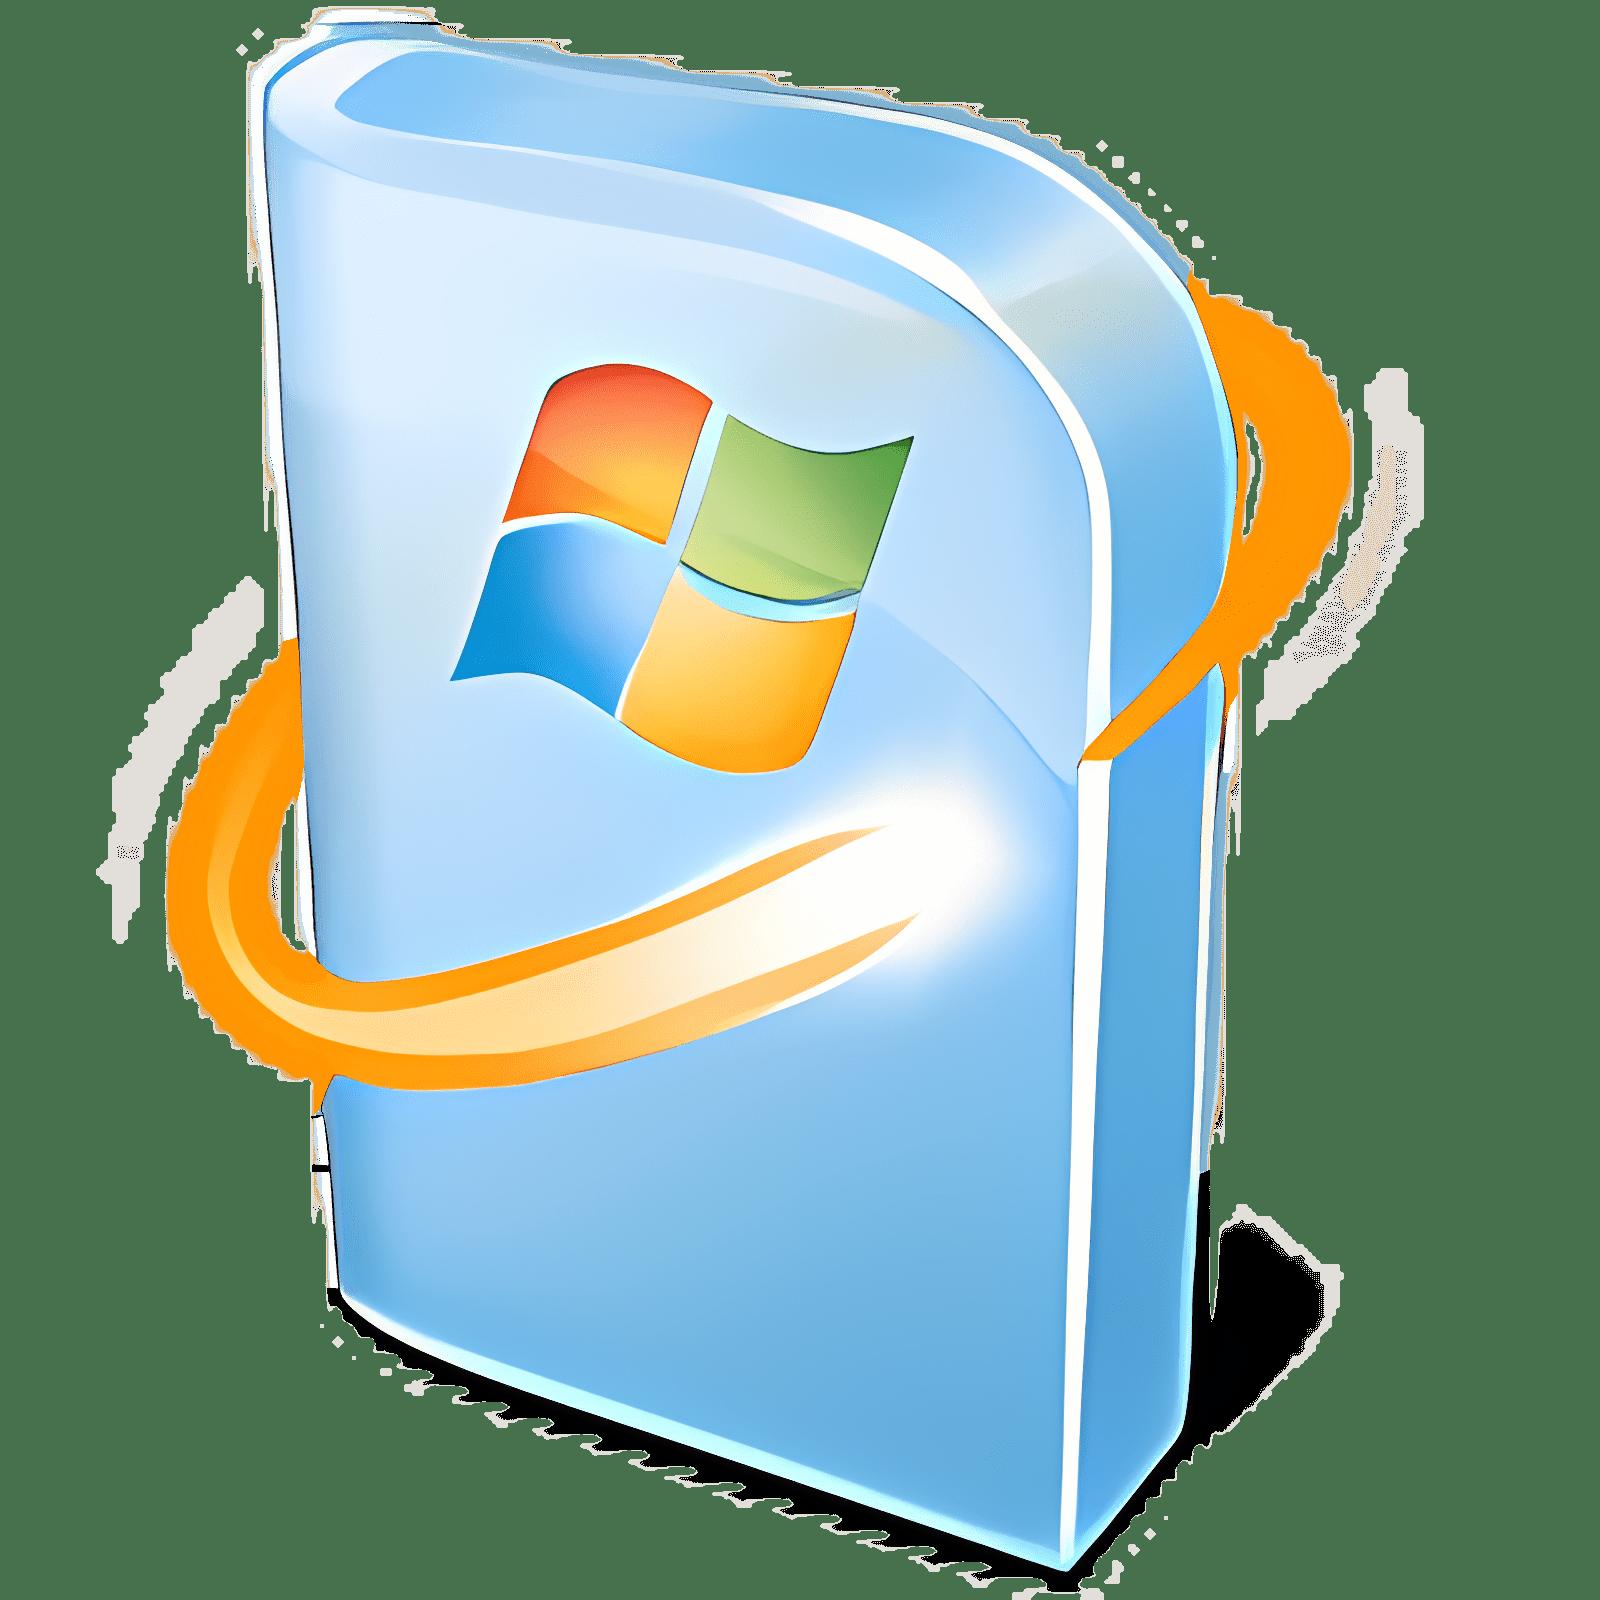 Windows 7 Service Pack 1 (SP1) 64-bit